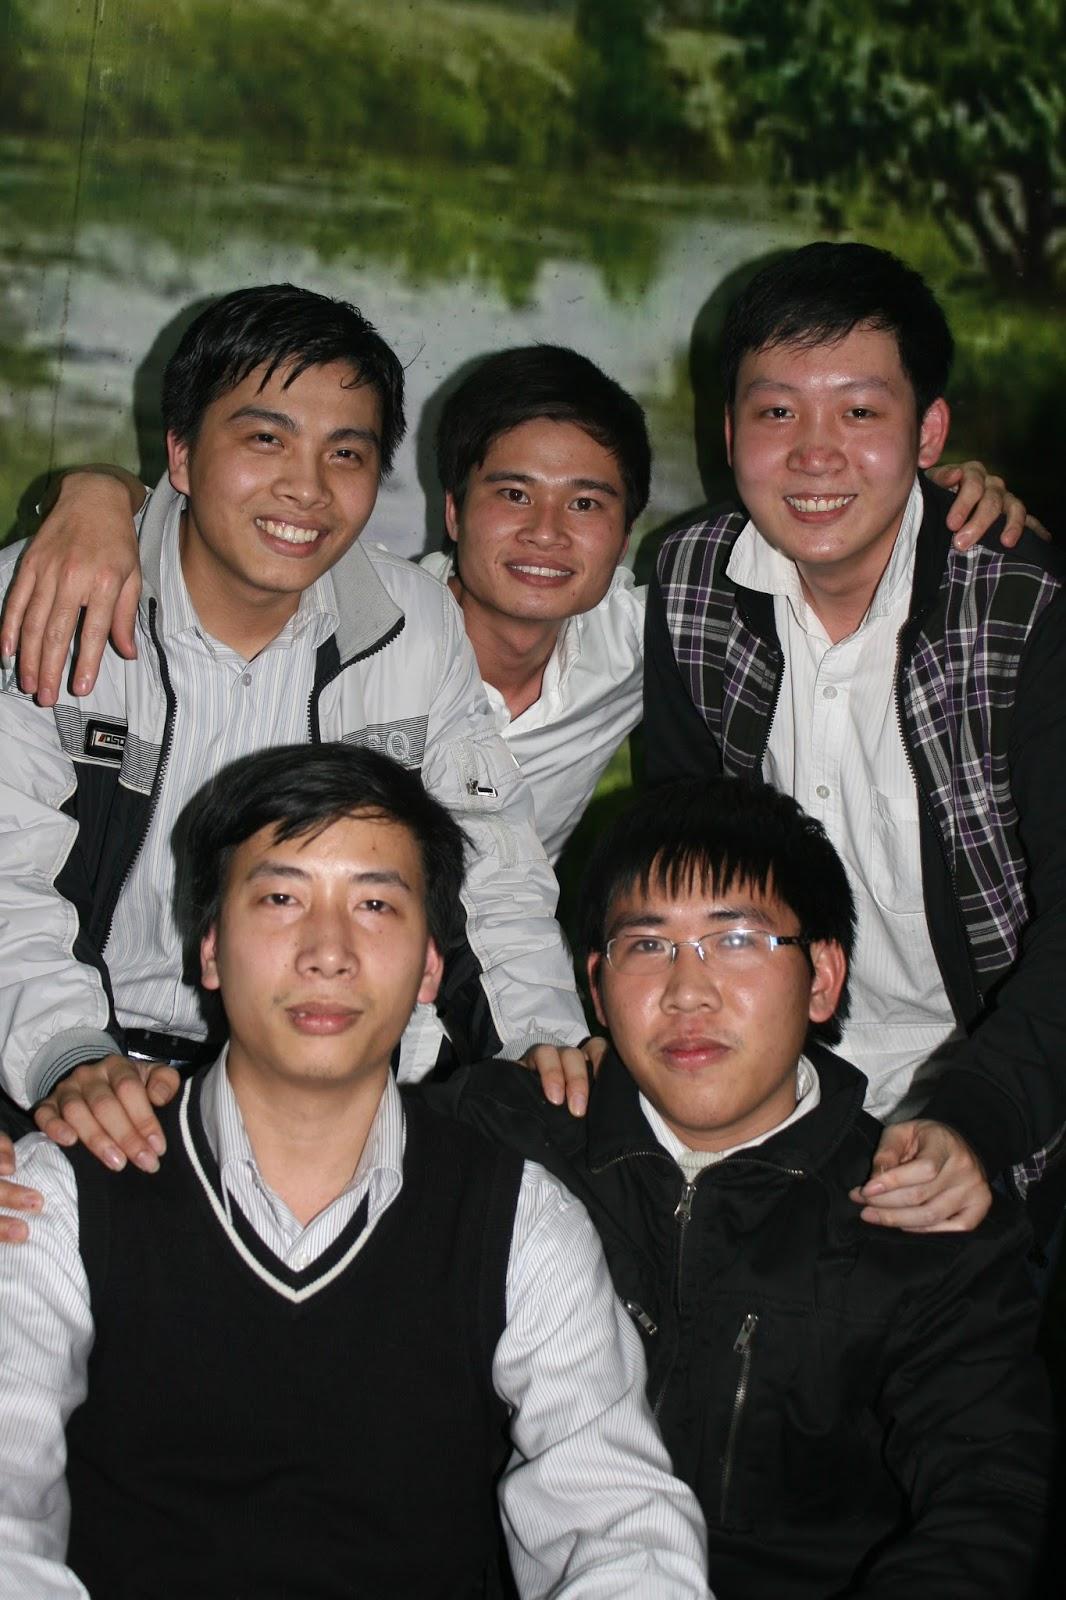 Team code Pixshare 2010